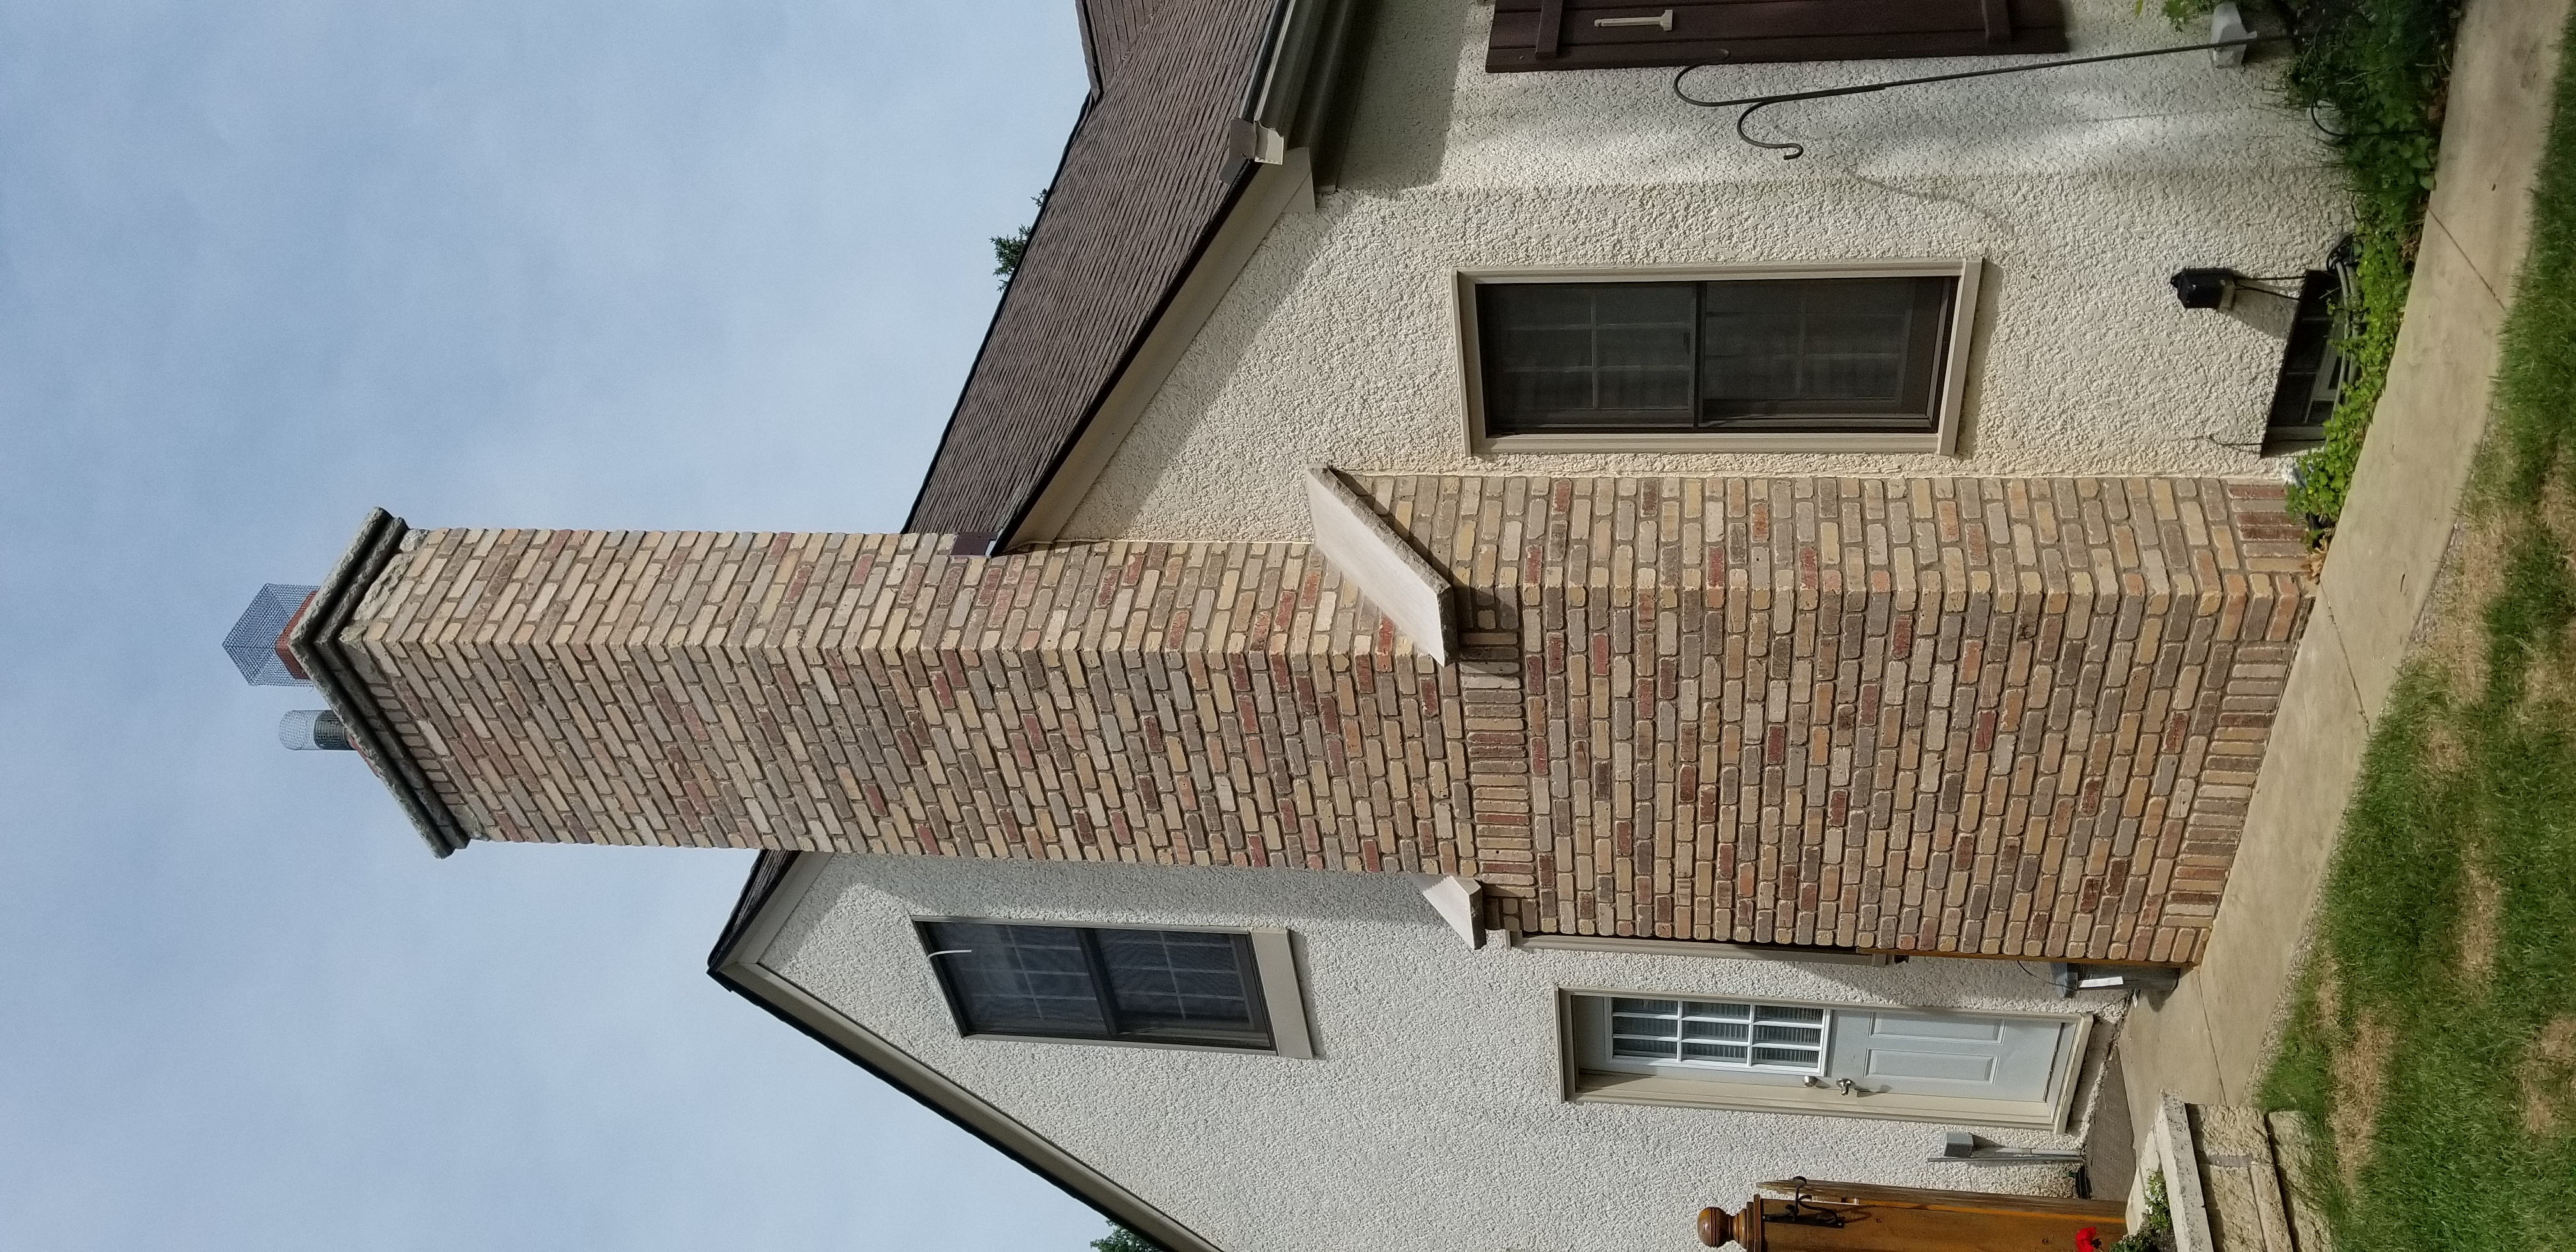 Brick Chimneys (35)